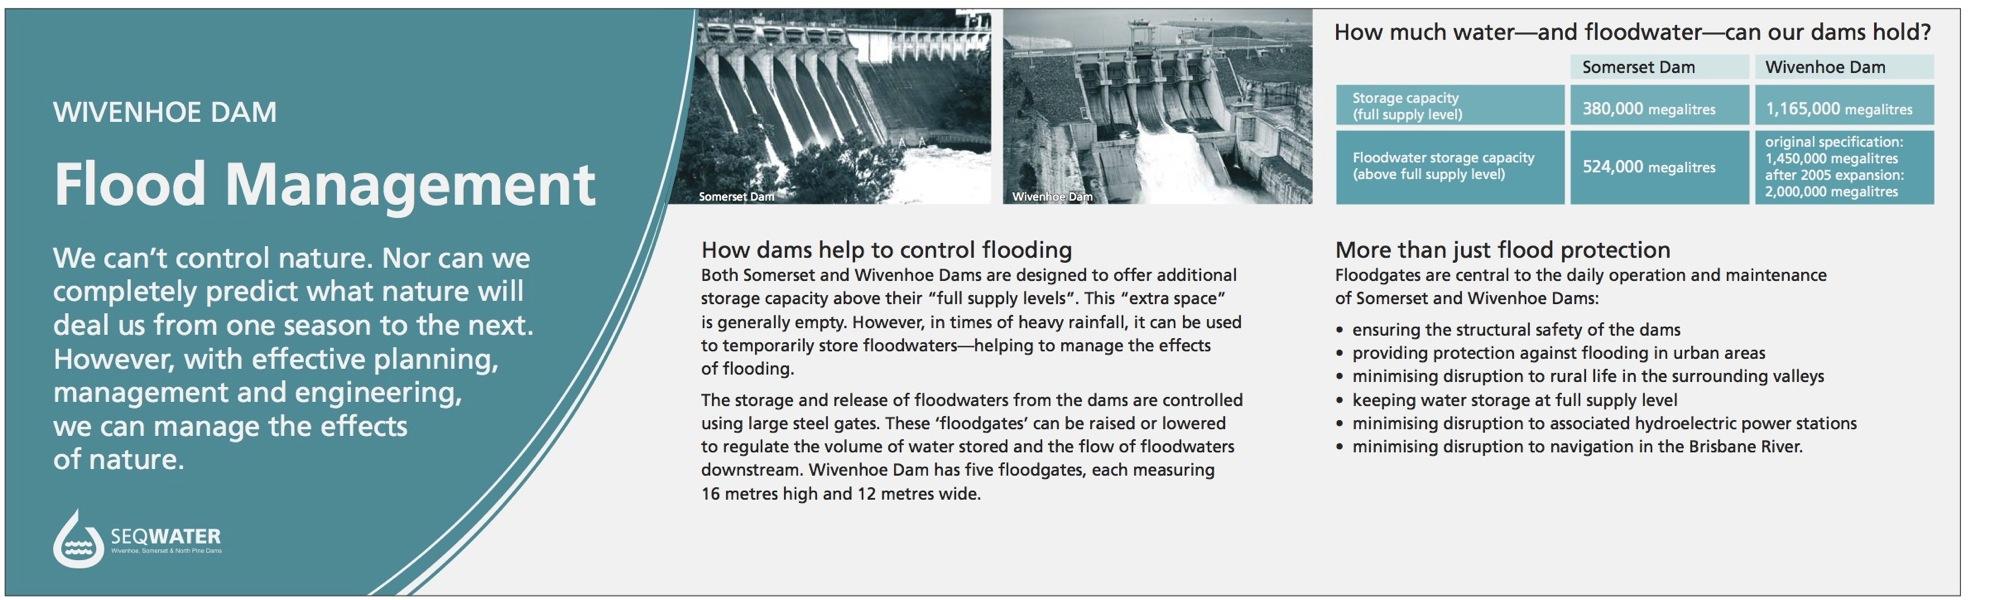 Wivenhoe Dam interpretive signage | Al et al | Alan James